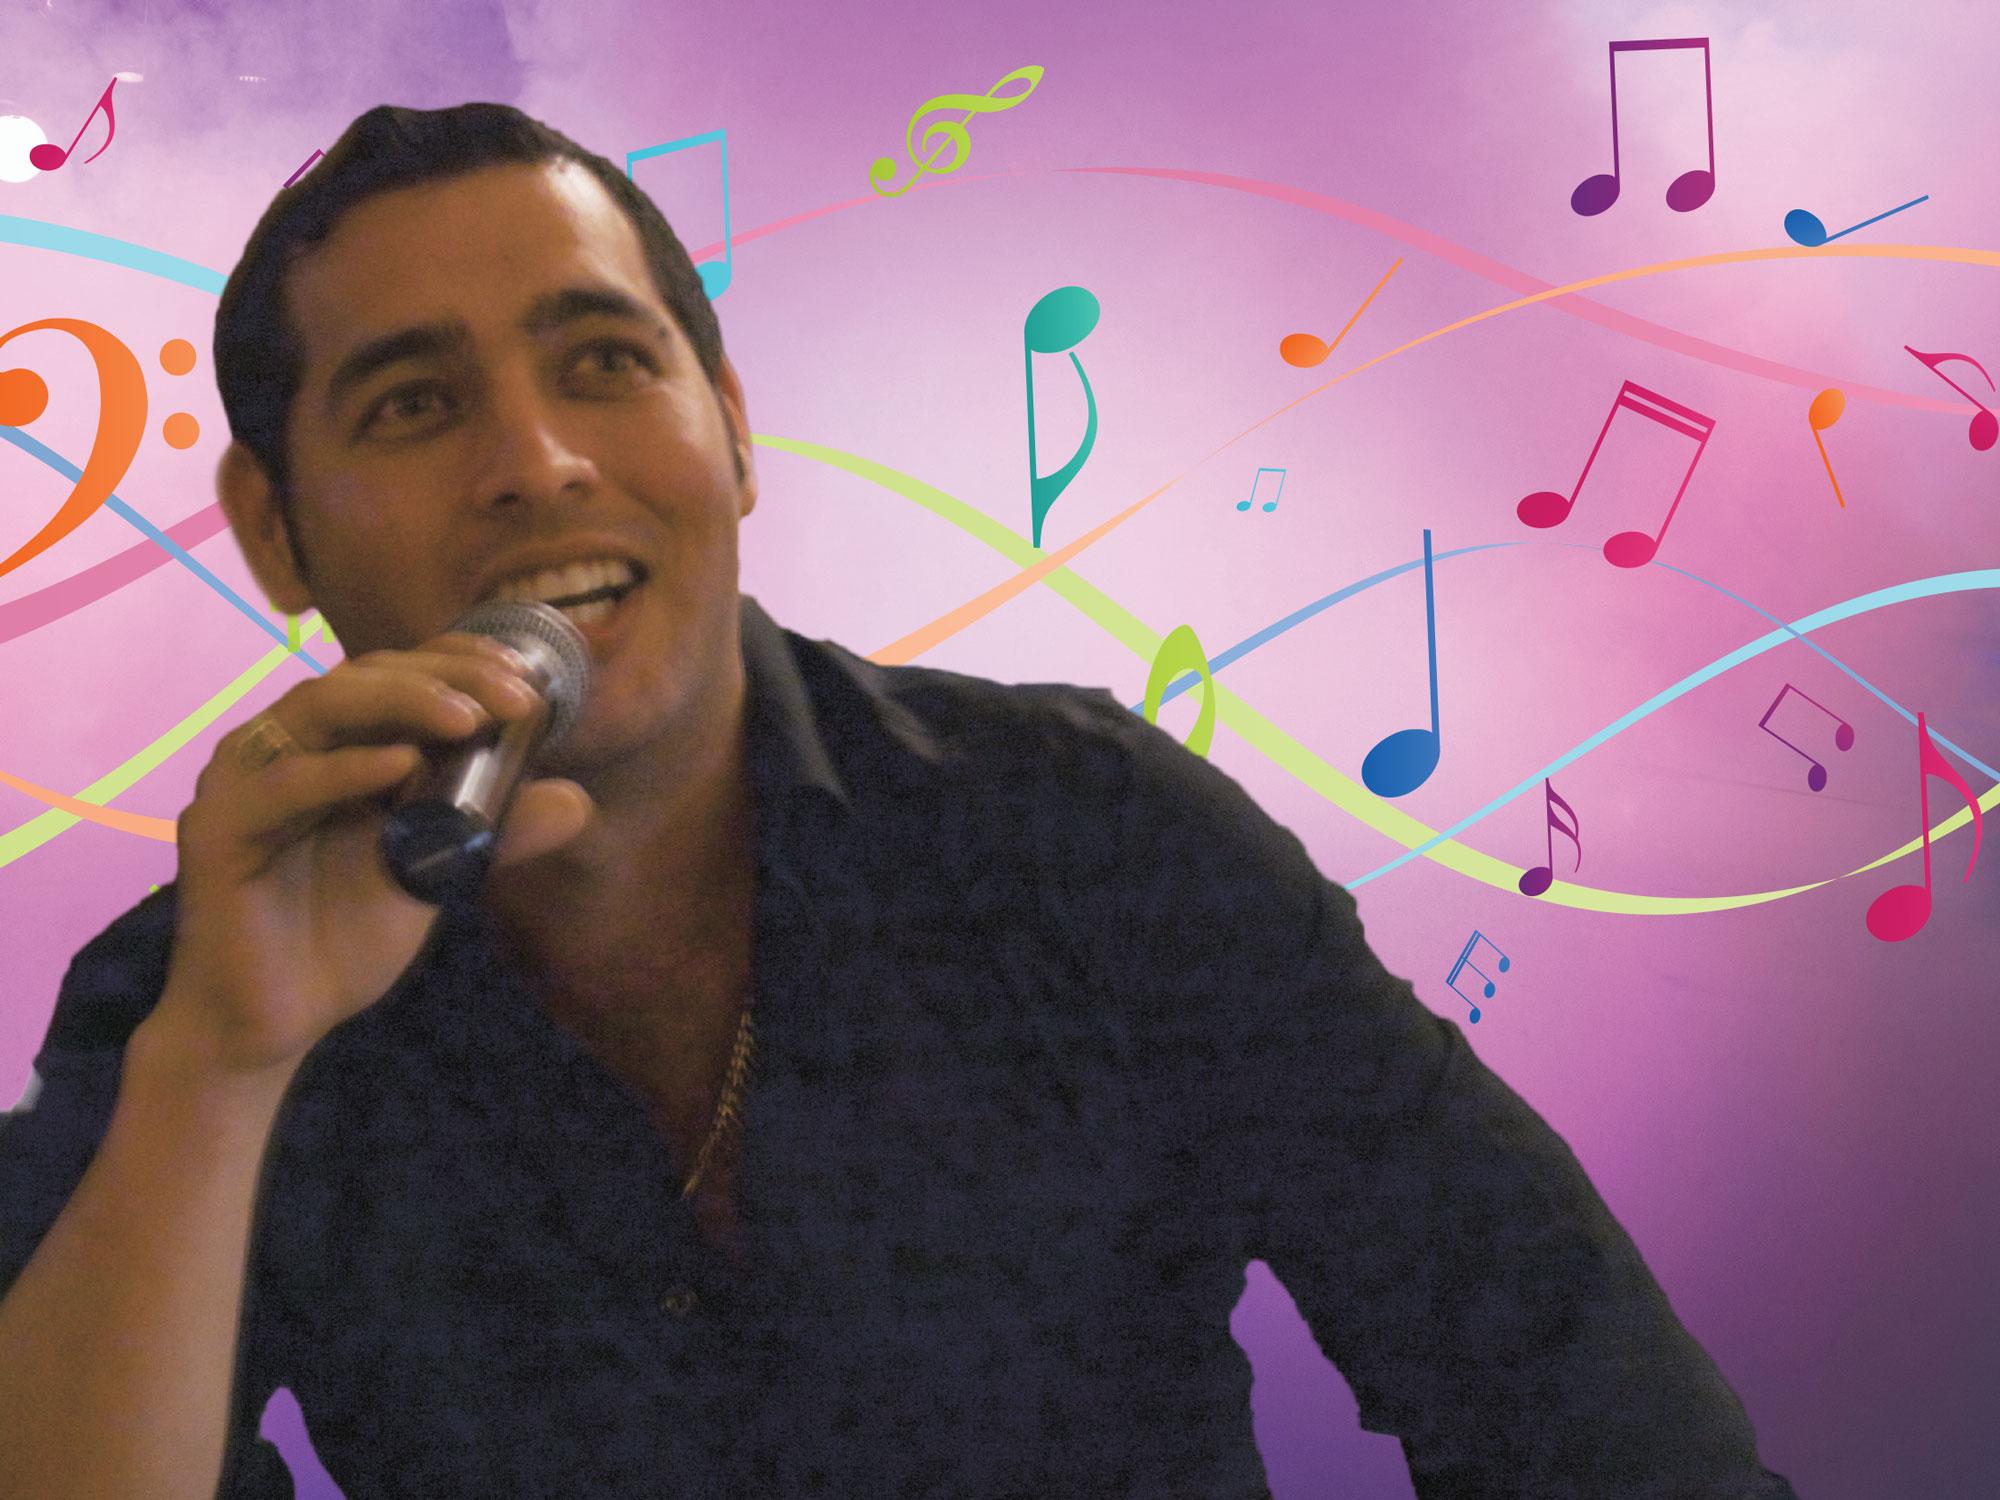 Sing a simple song: International karaoke in Greensboro | The NC